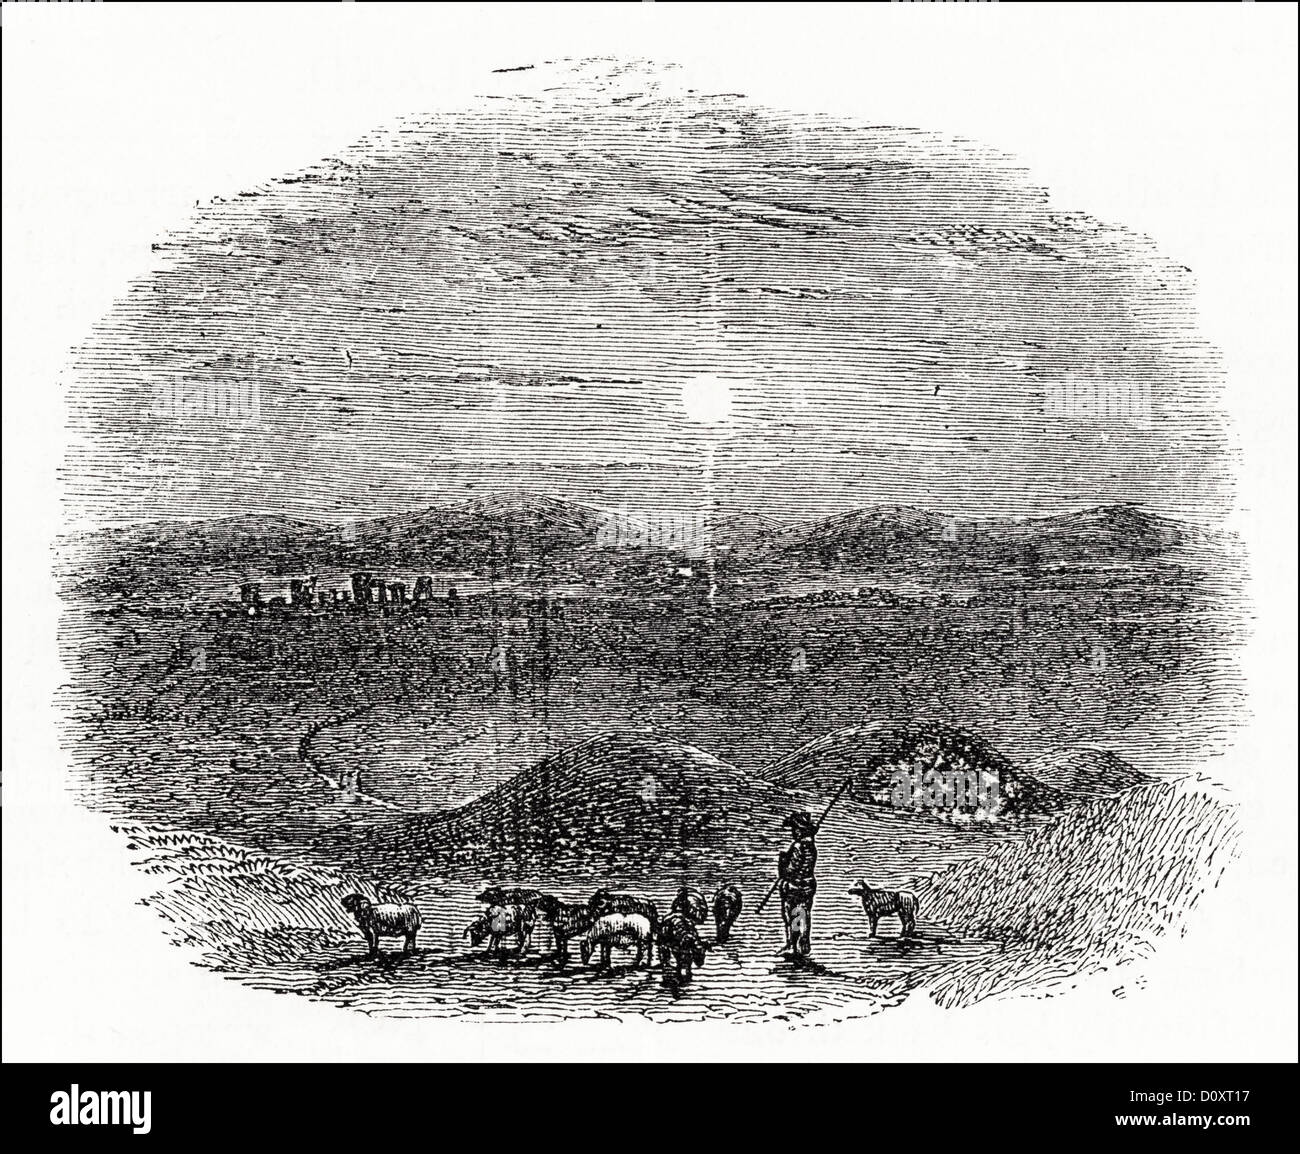 Victorian woodcut engraving circa 1864 showing Sarum Plain with shepherd and flock of sheep looking toward Stonehenge. - Stock Image